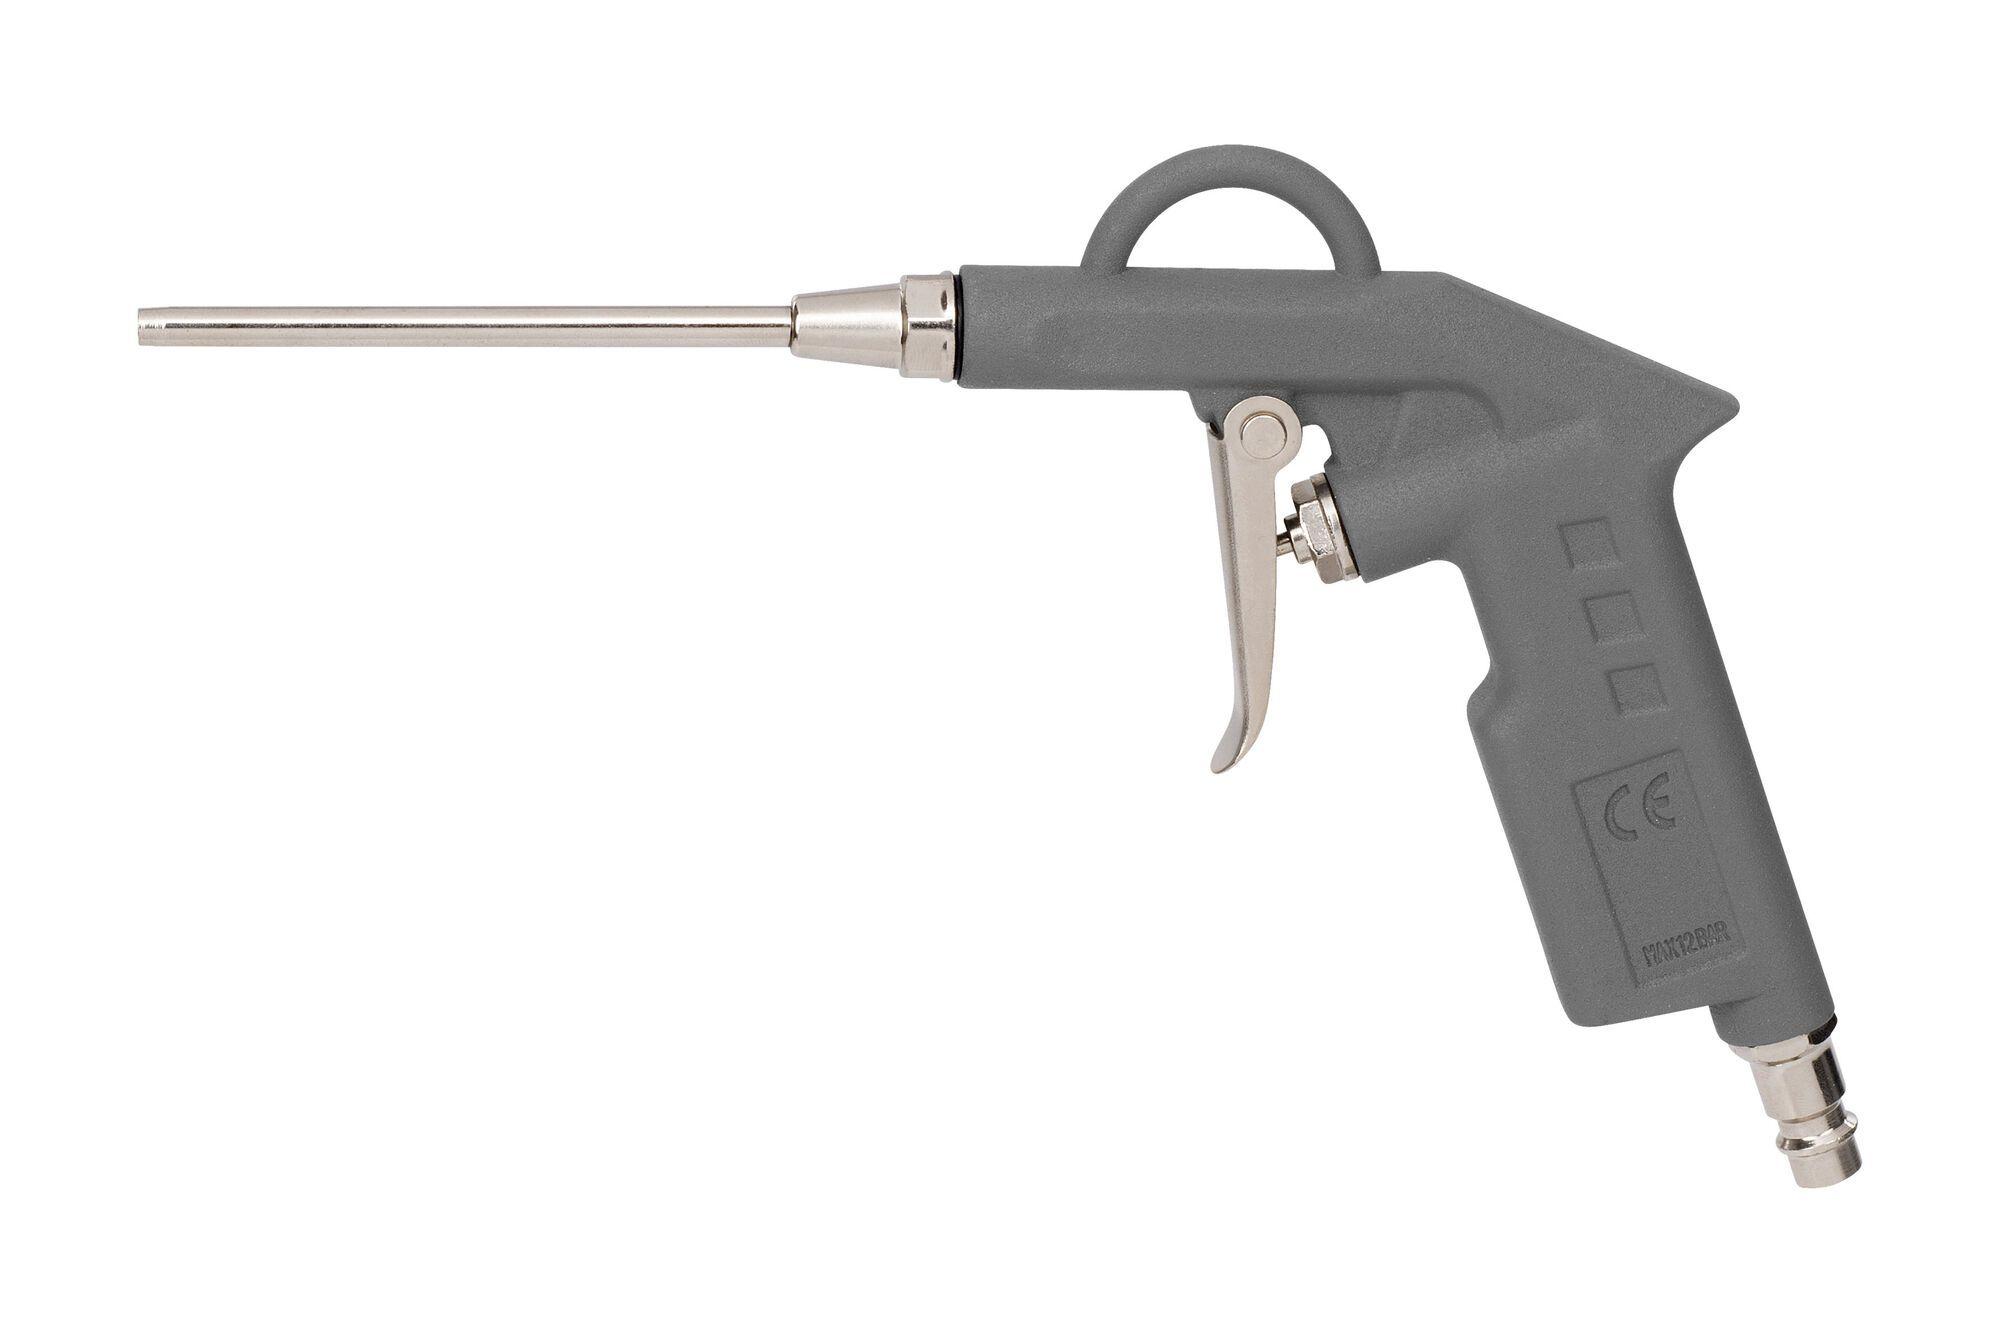 Powerplus POWAIR0104 Pneumatisch blaaspistool | Luchtpistool lange neus (blaaspistool)